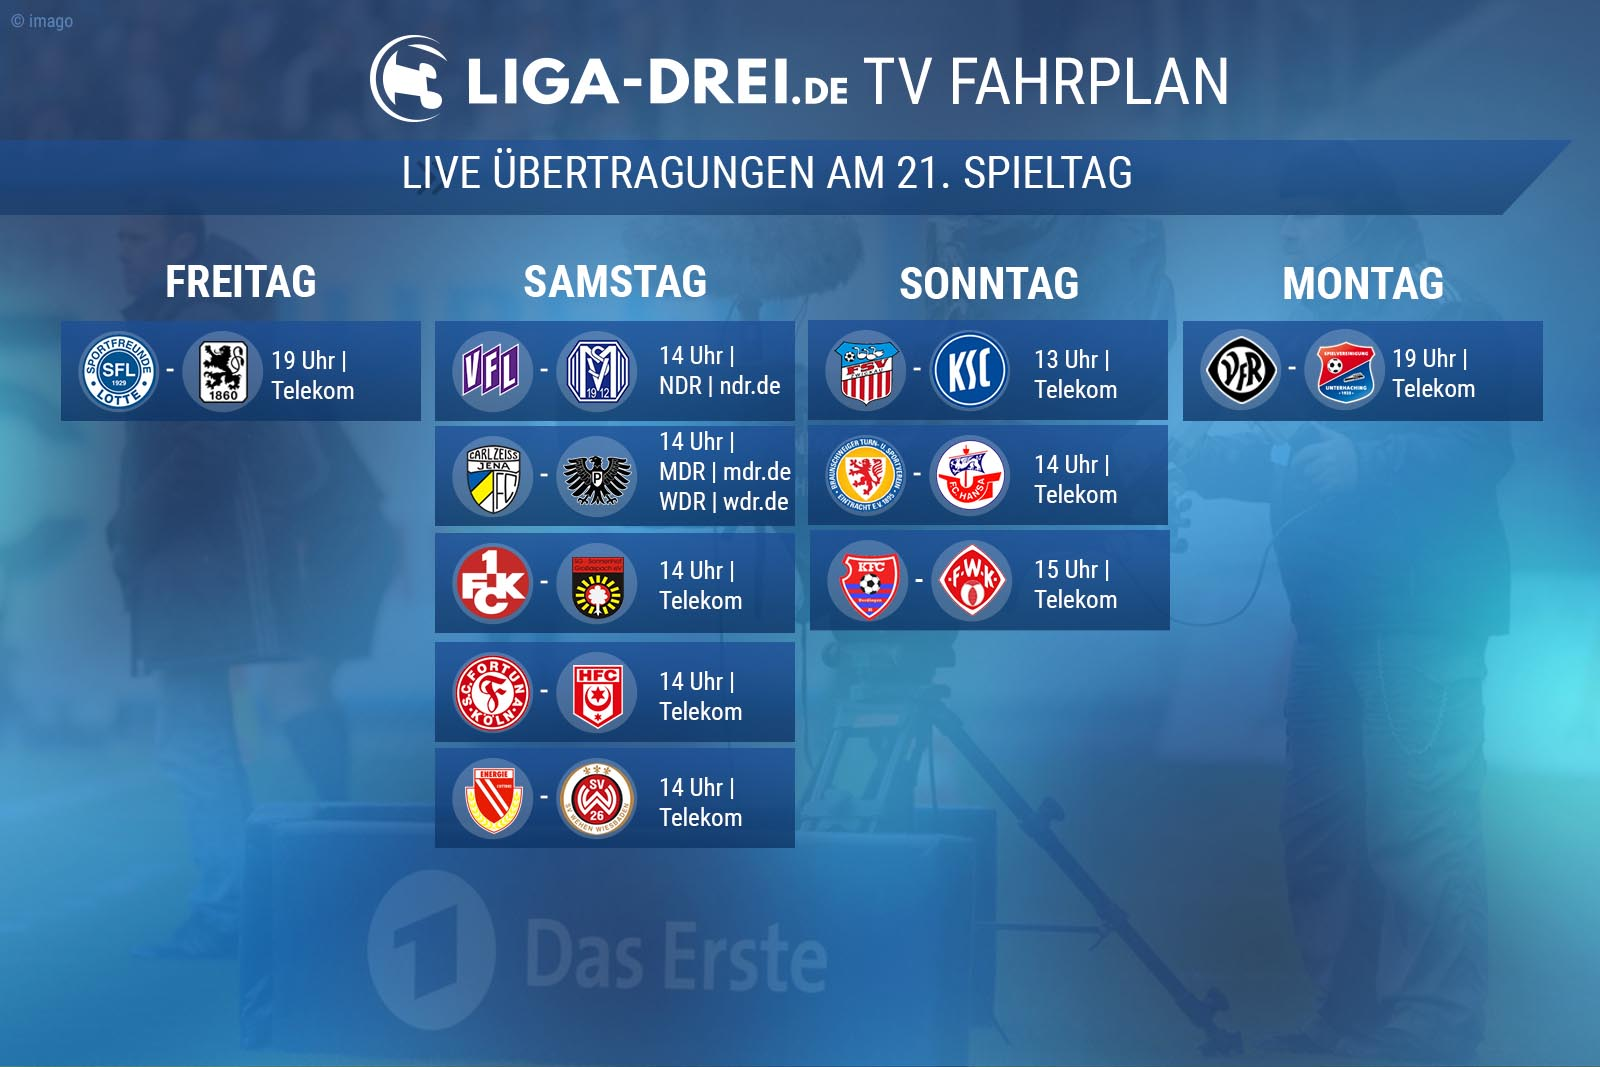 TV-Fahrplan der 3. Liga